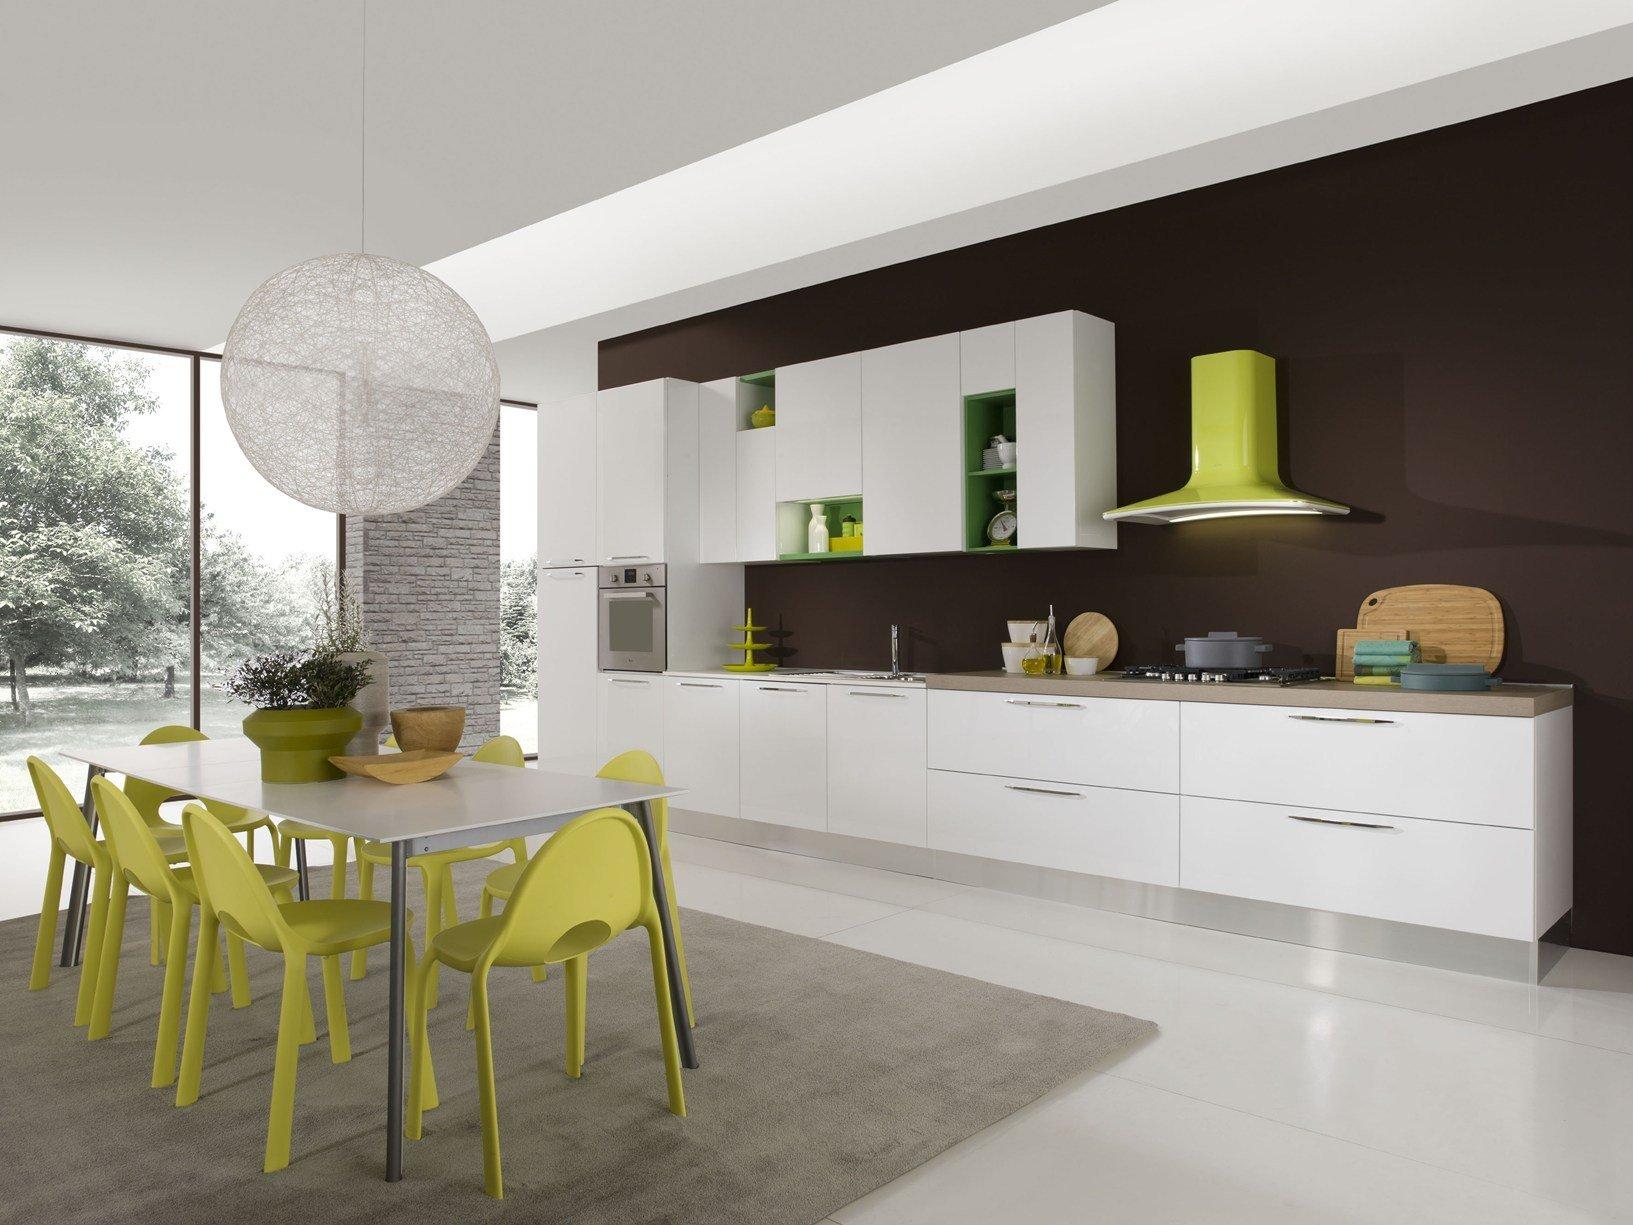 aran cucine presenta in anteprima bella. Black Bedroom Furniture Sets. Home Design Ideas